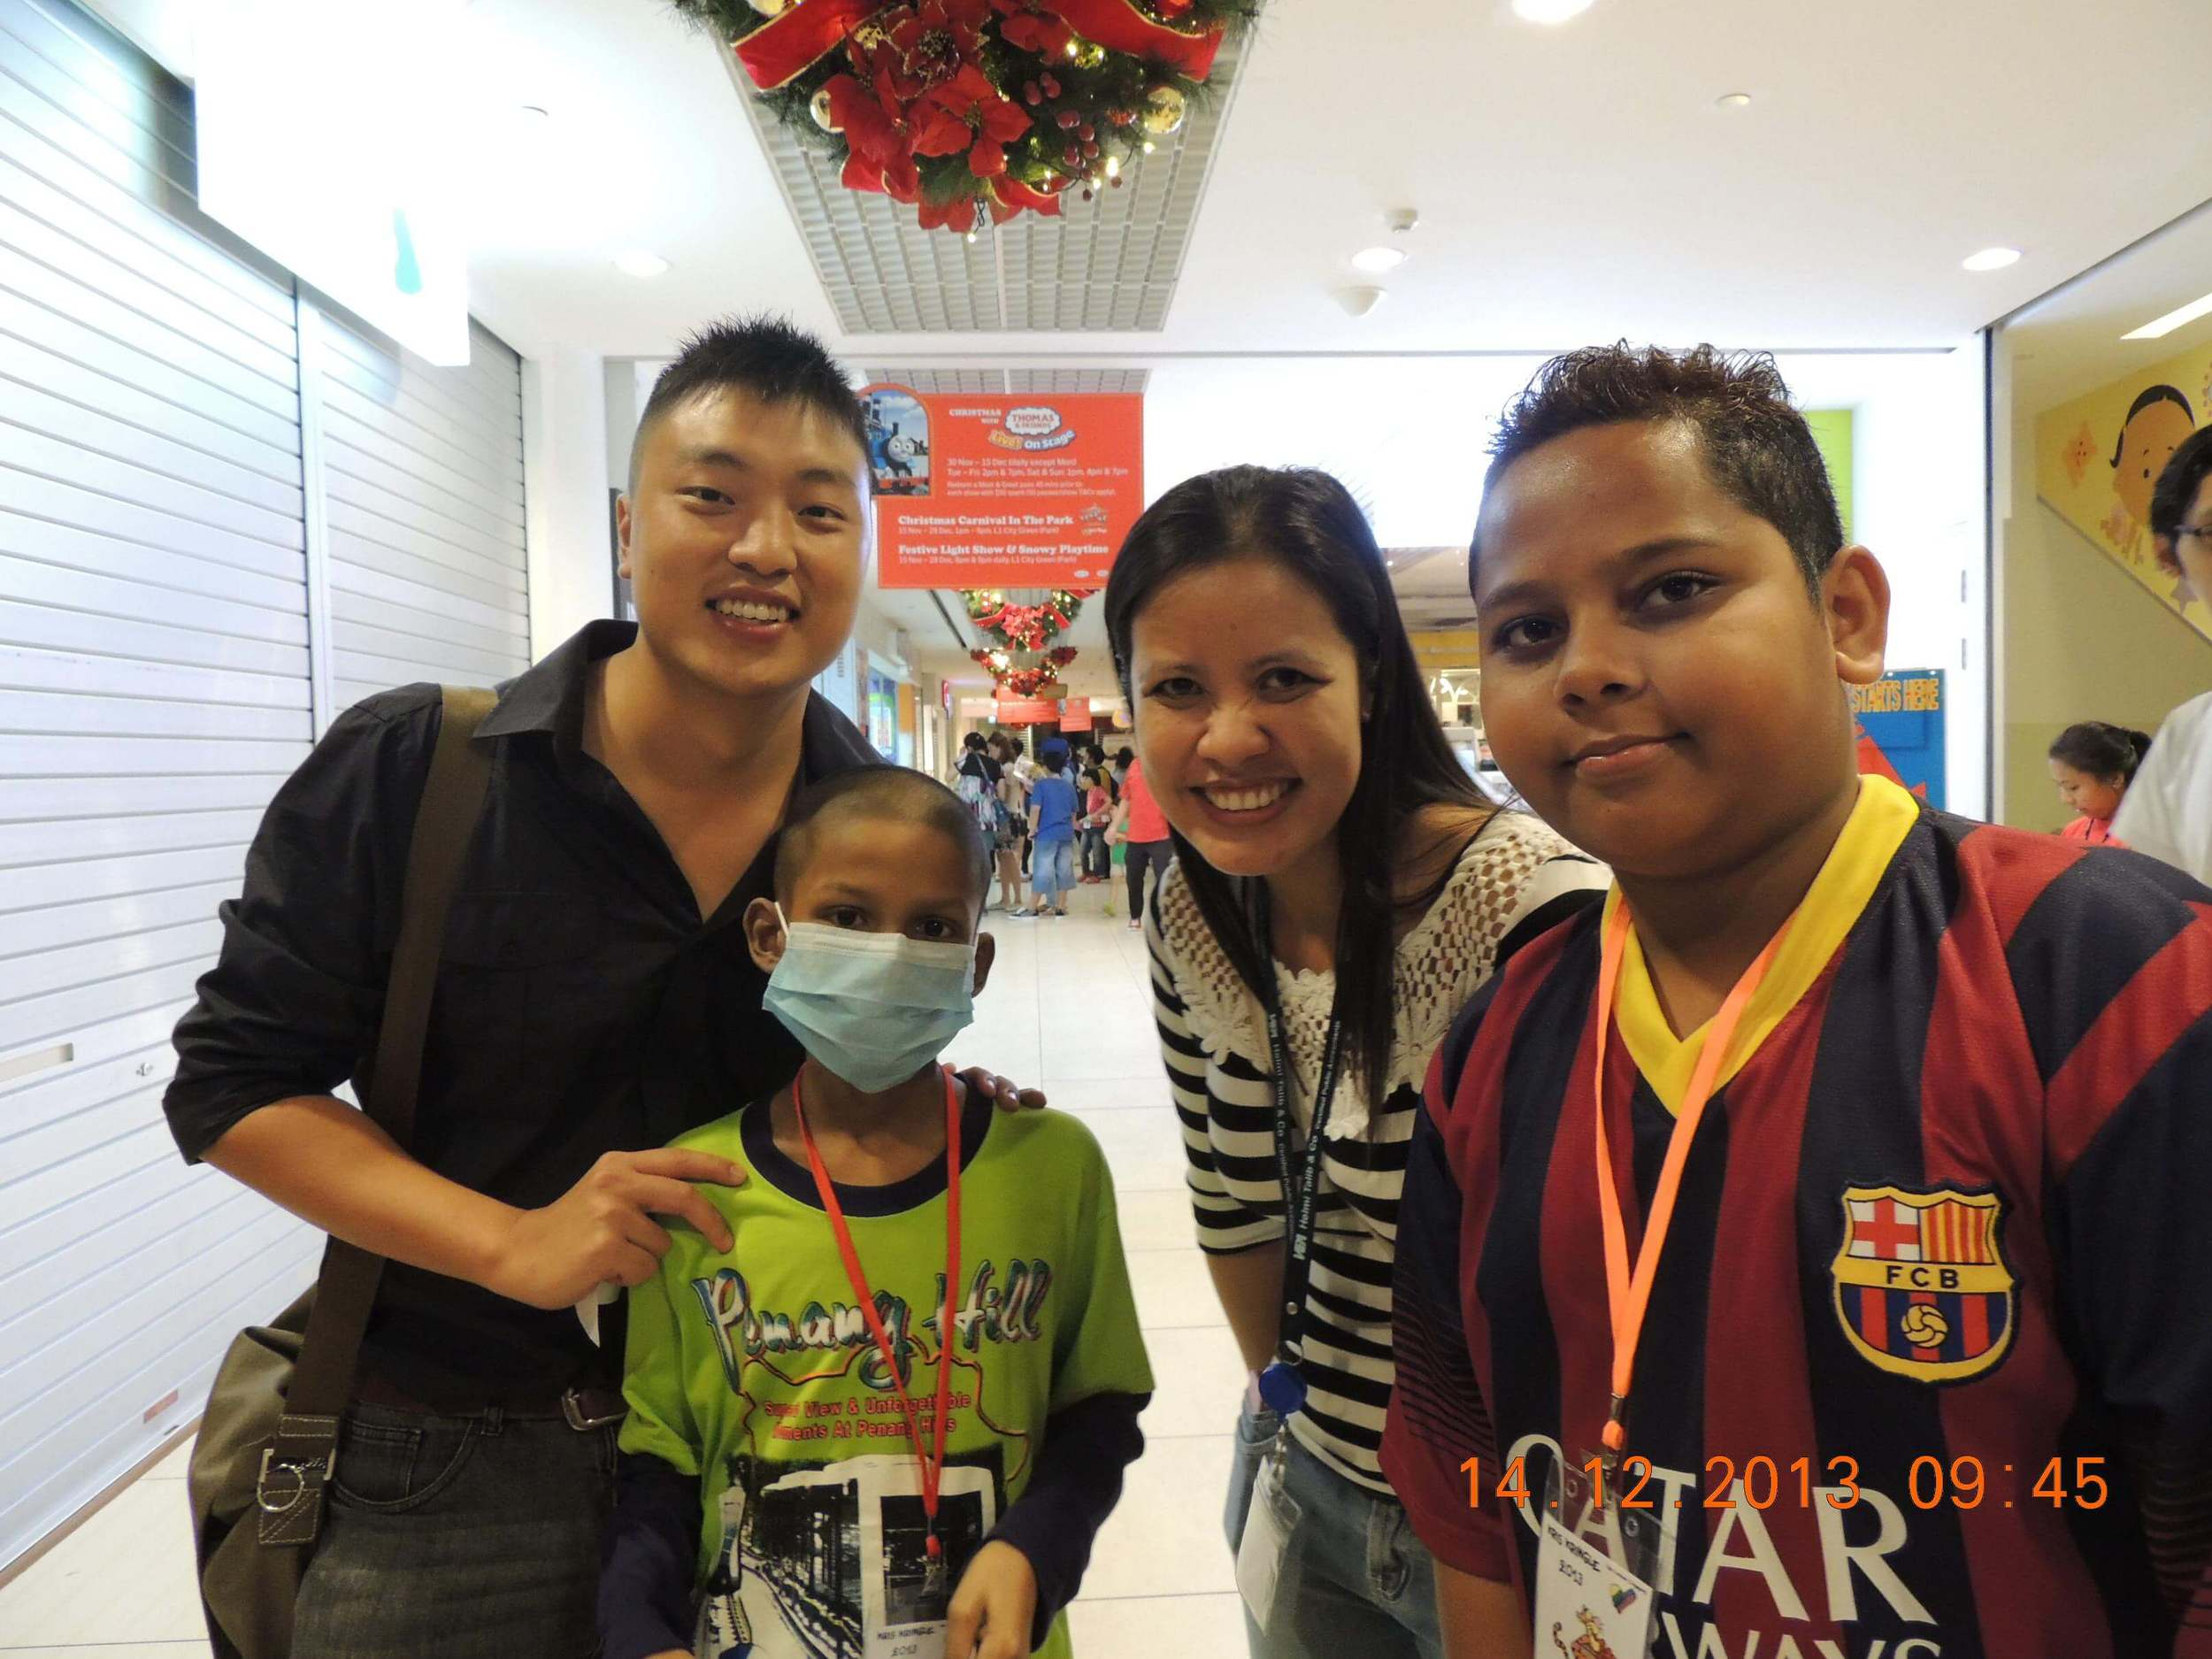 Club Rainbow Singapore Kris Kringle 2013-5.jpg